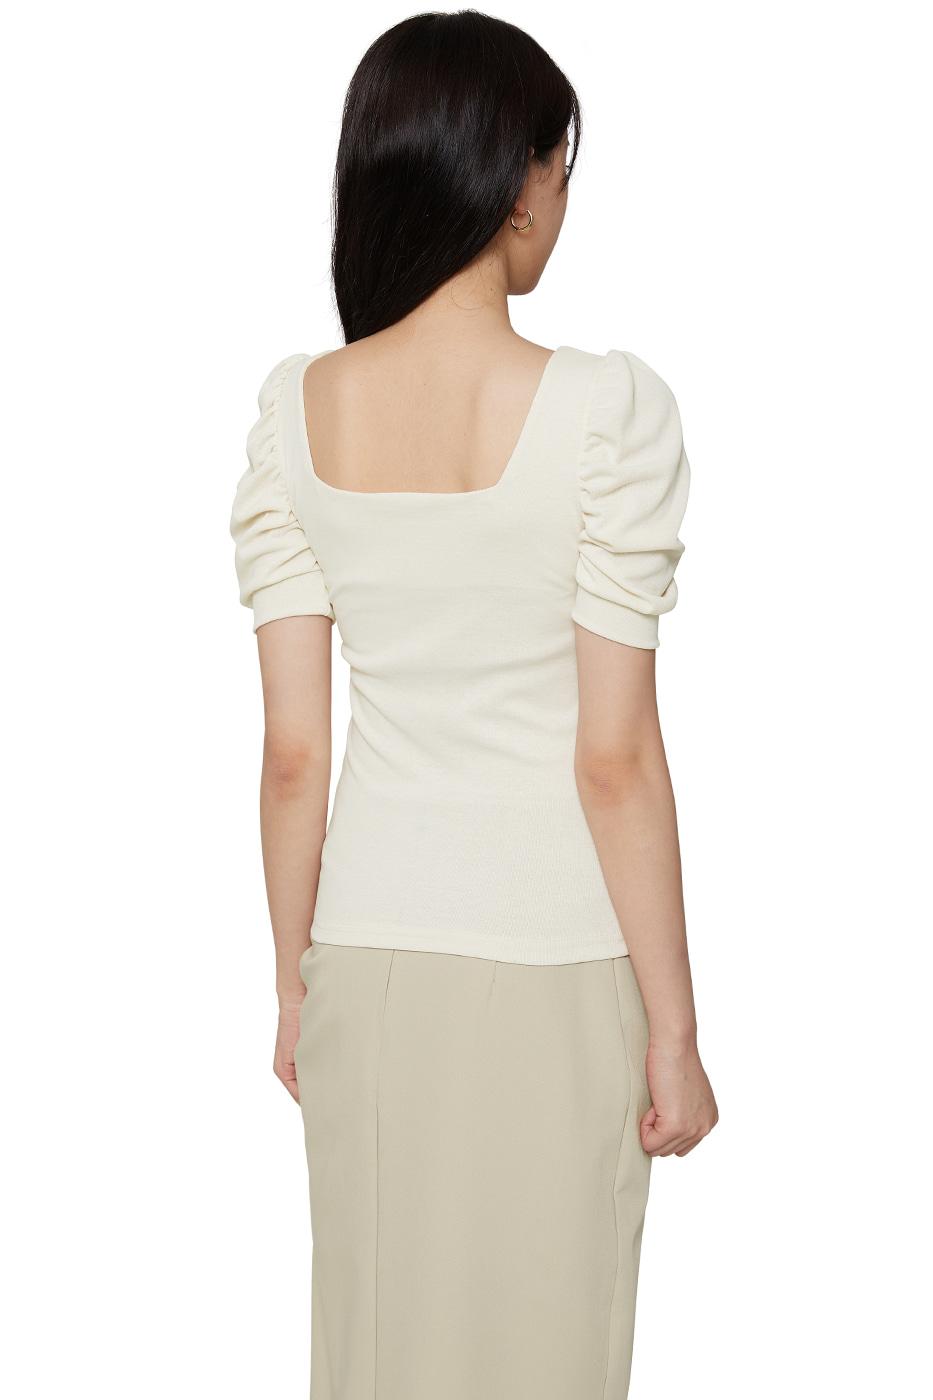 Melting shirred square-neck top